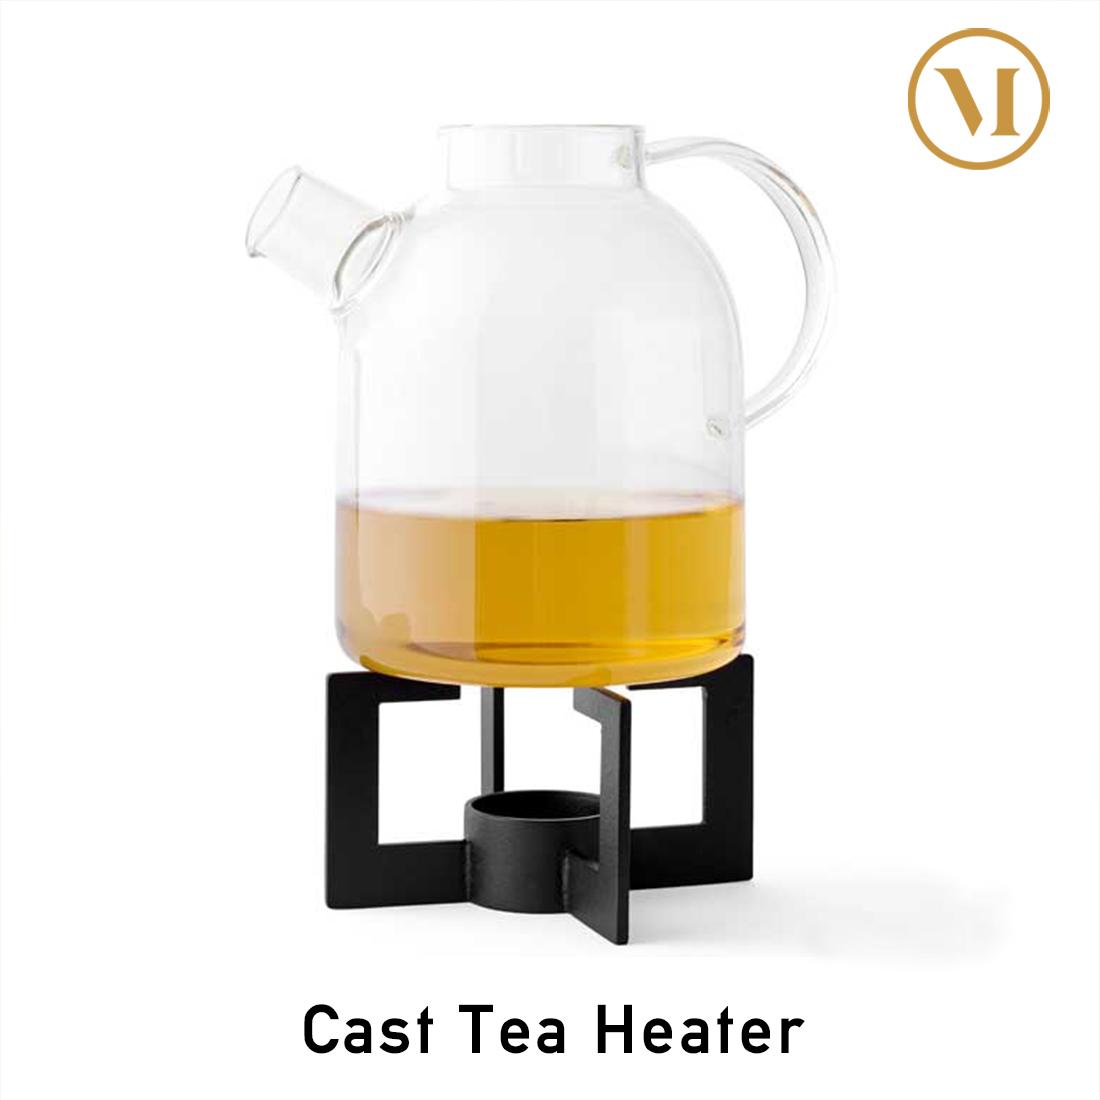 【menu】Cast Tea Heater キャスト ティーヒーター 4545539 メニュー/MENU/コンビニ受取対応